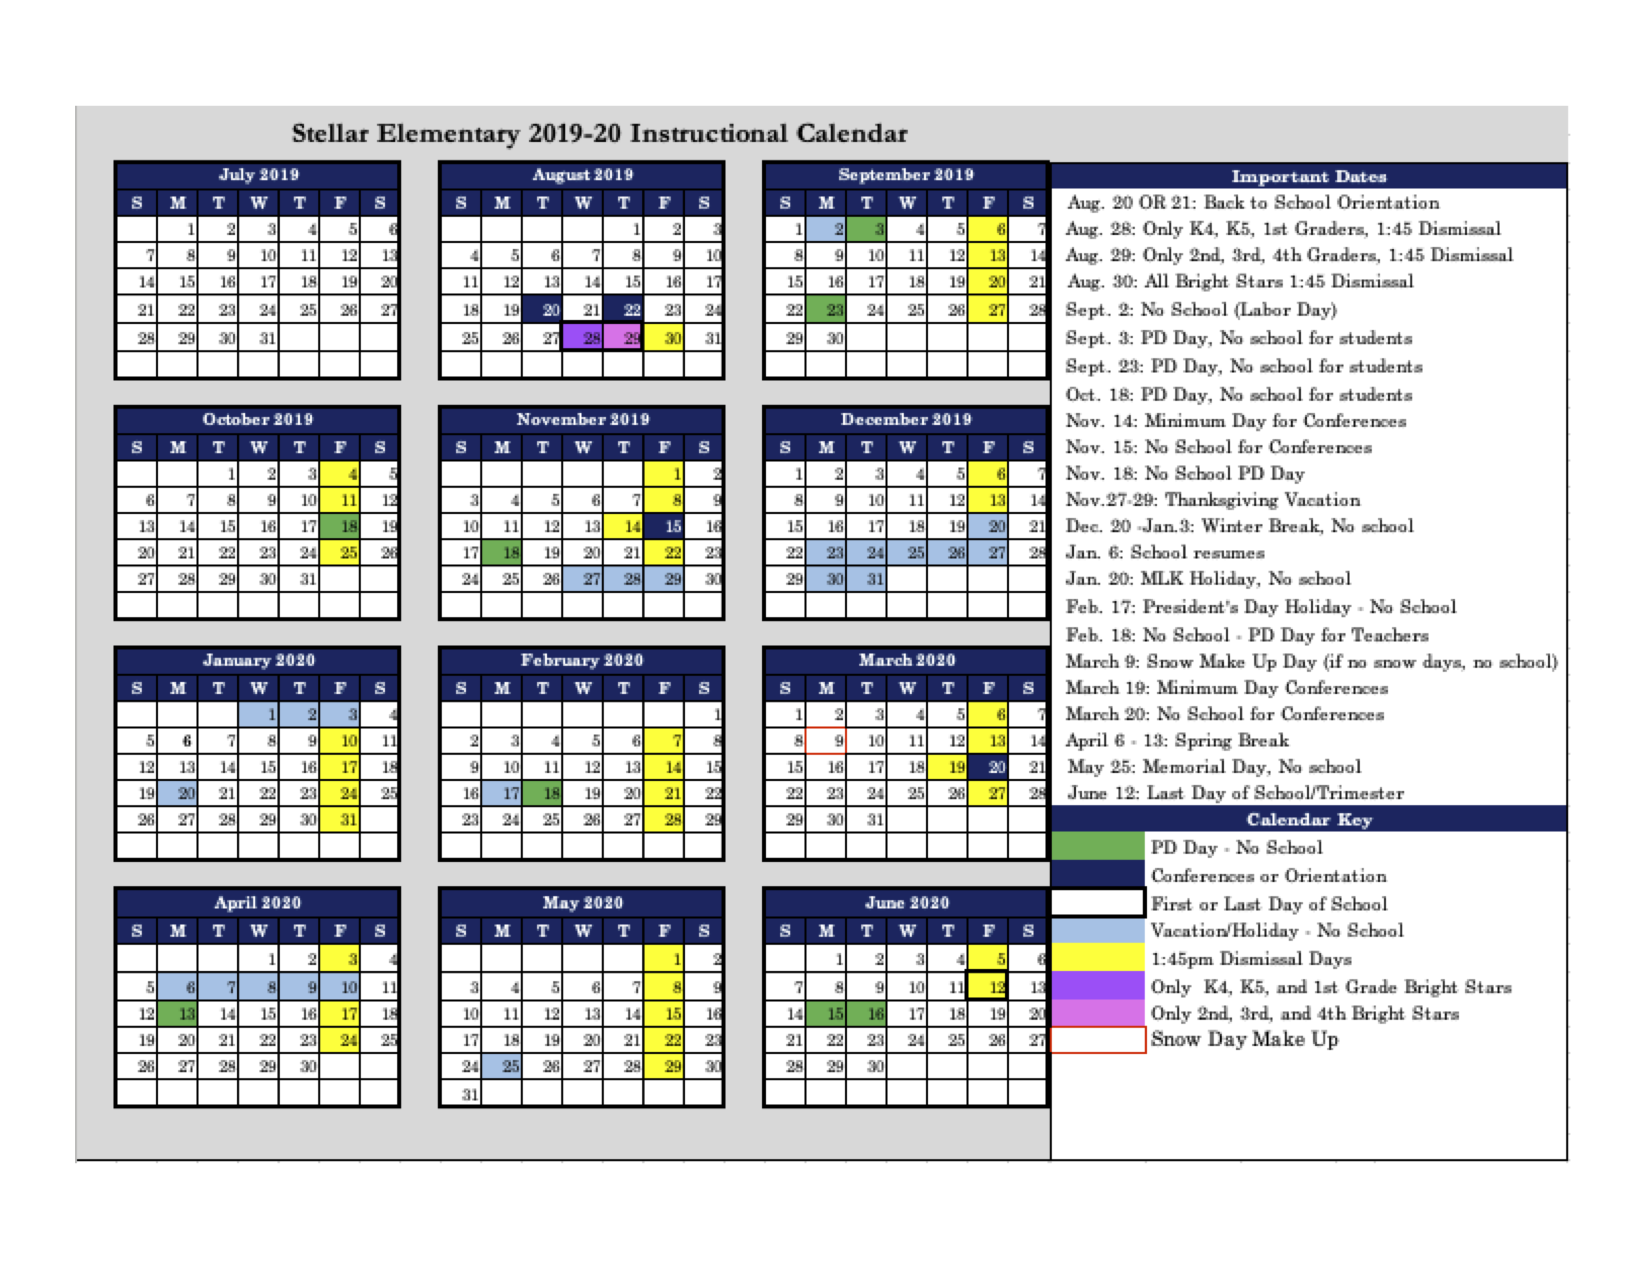 Microsoft Word - 19-20 Calendar UPDATED.png